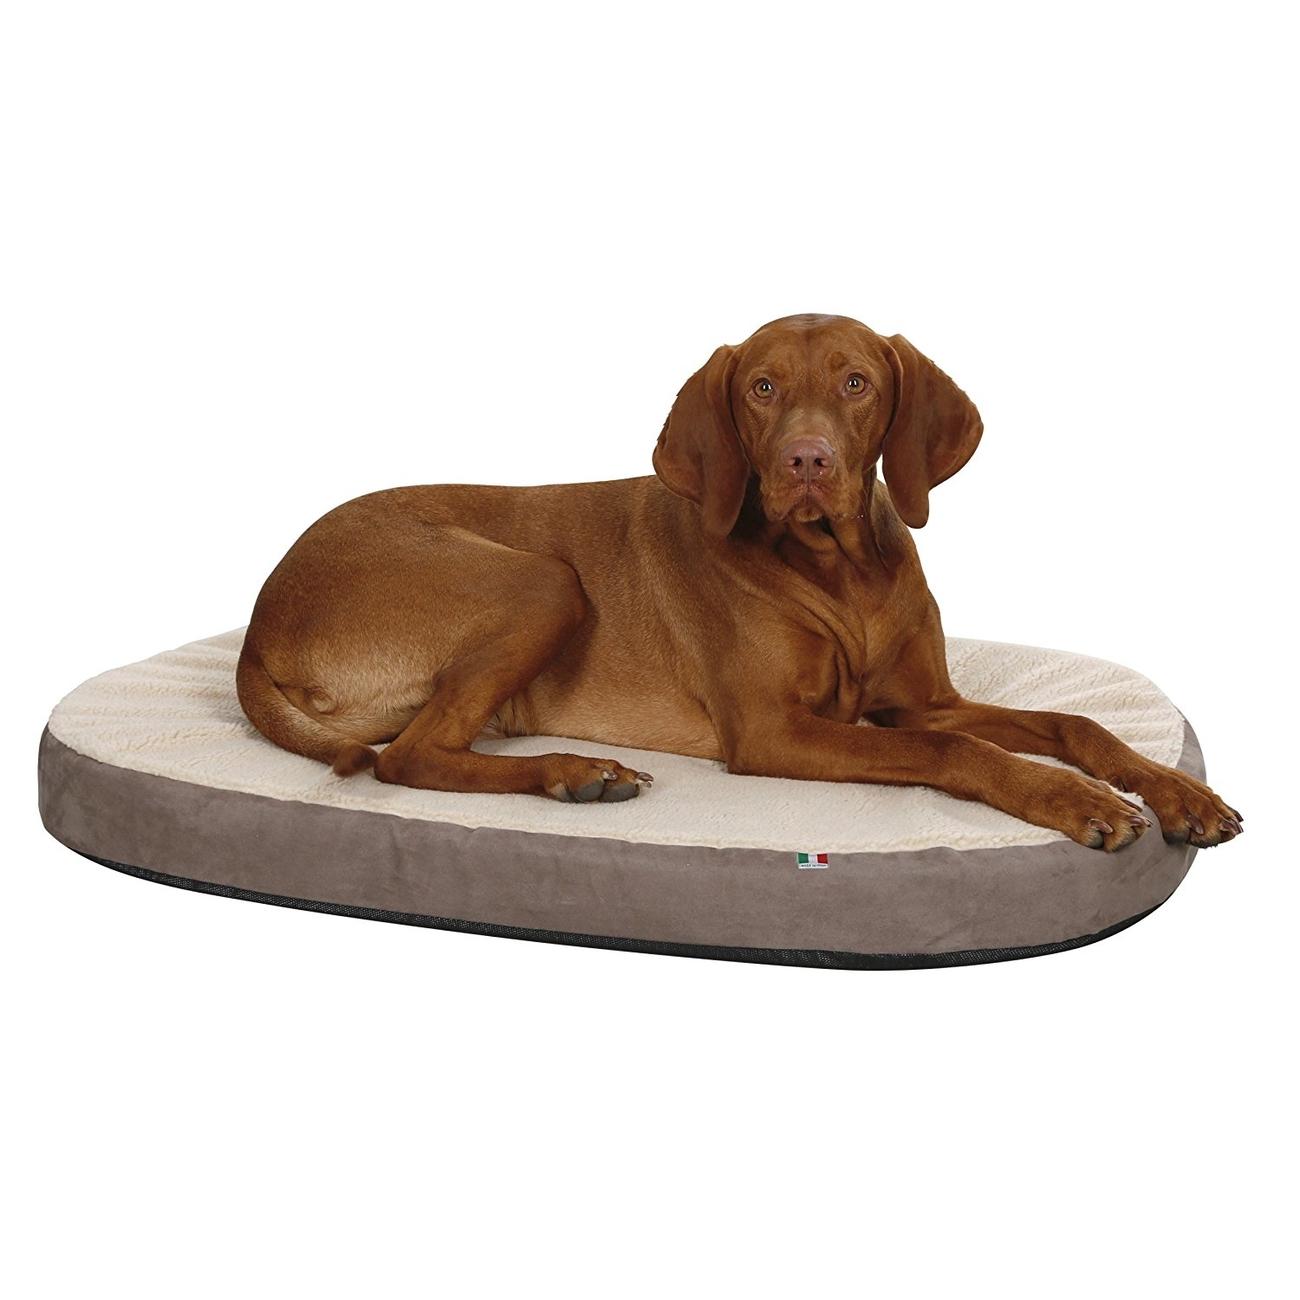 Kerbl Hunde Memory-Foam Matratze oval, Bild 2